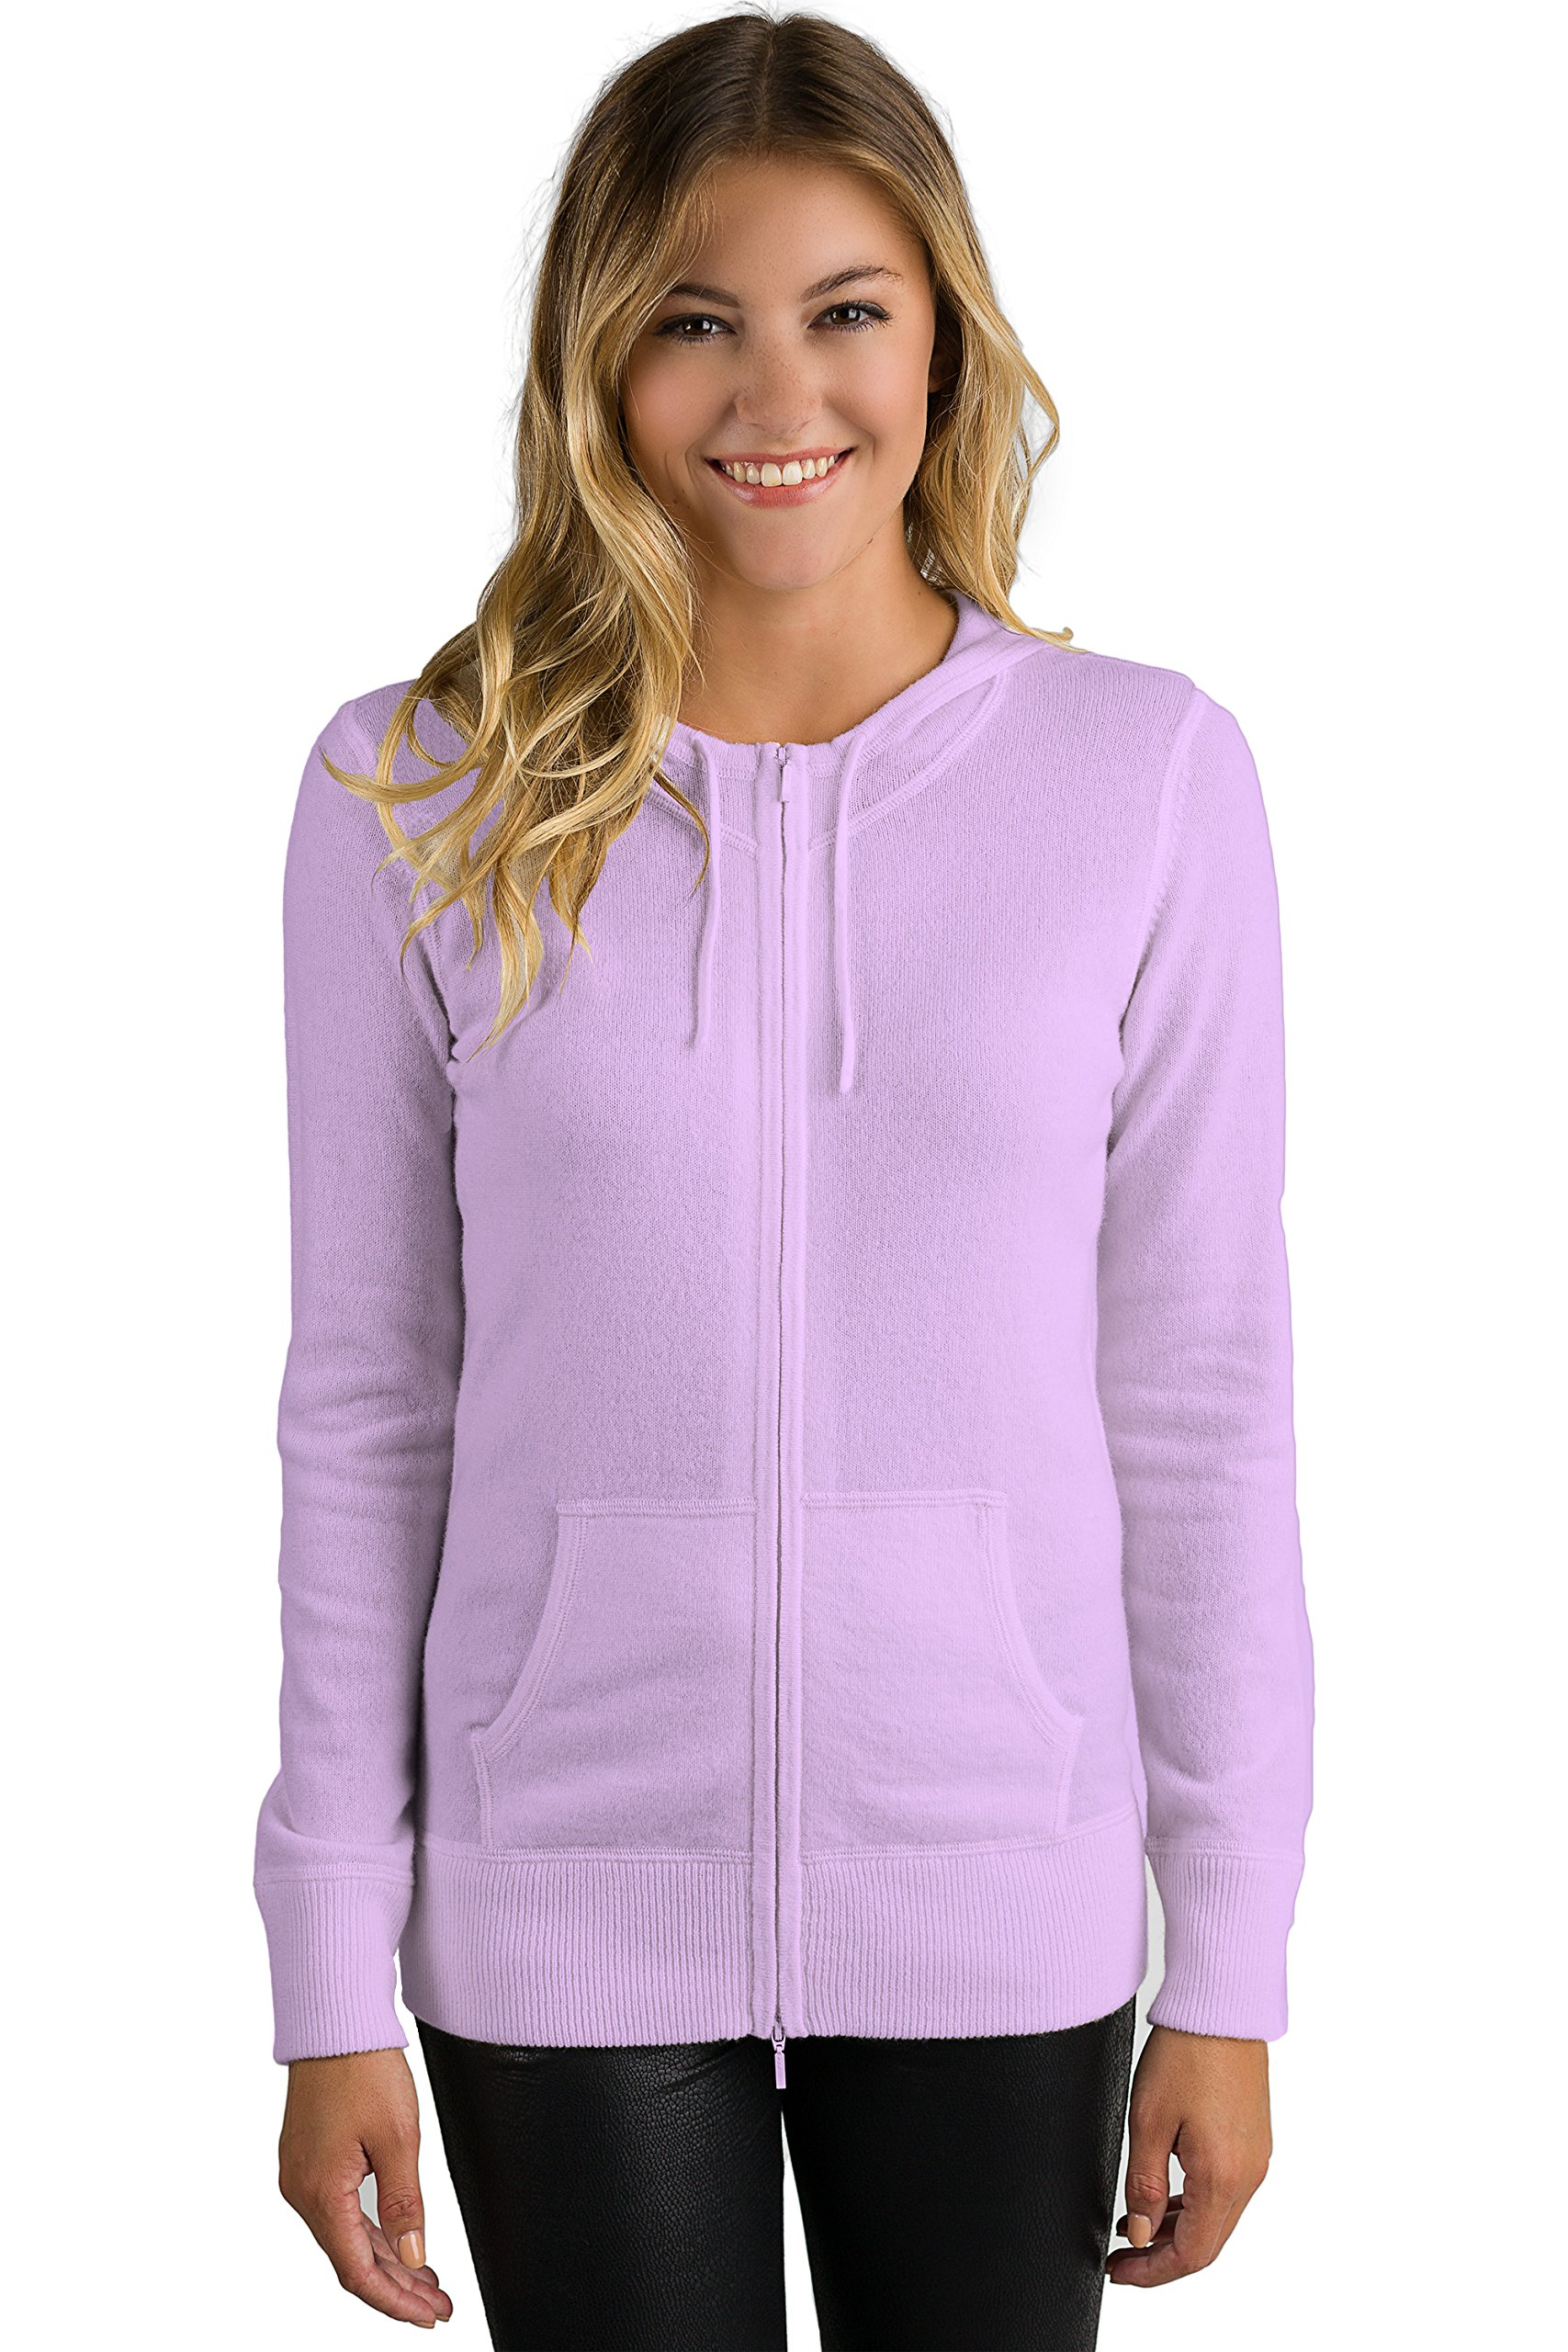 JENNIE LIU Women's 100% Pure Cashmere Long Sleeve Zip Hoodie Cardigan Sweater (M, Wisteria)